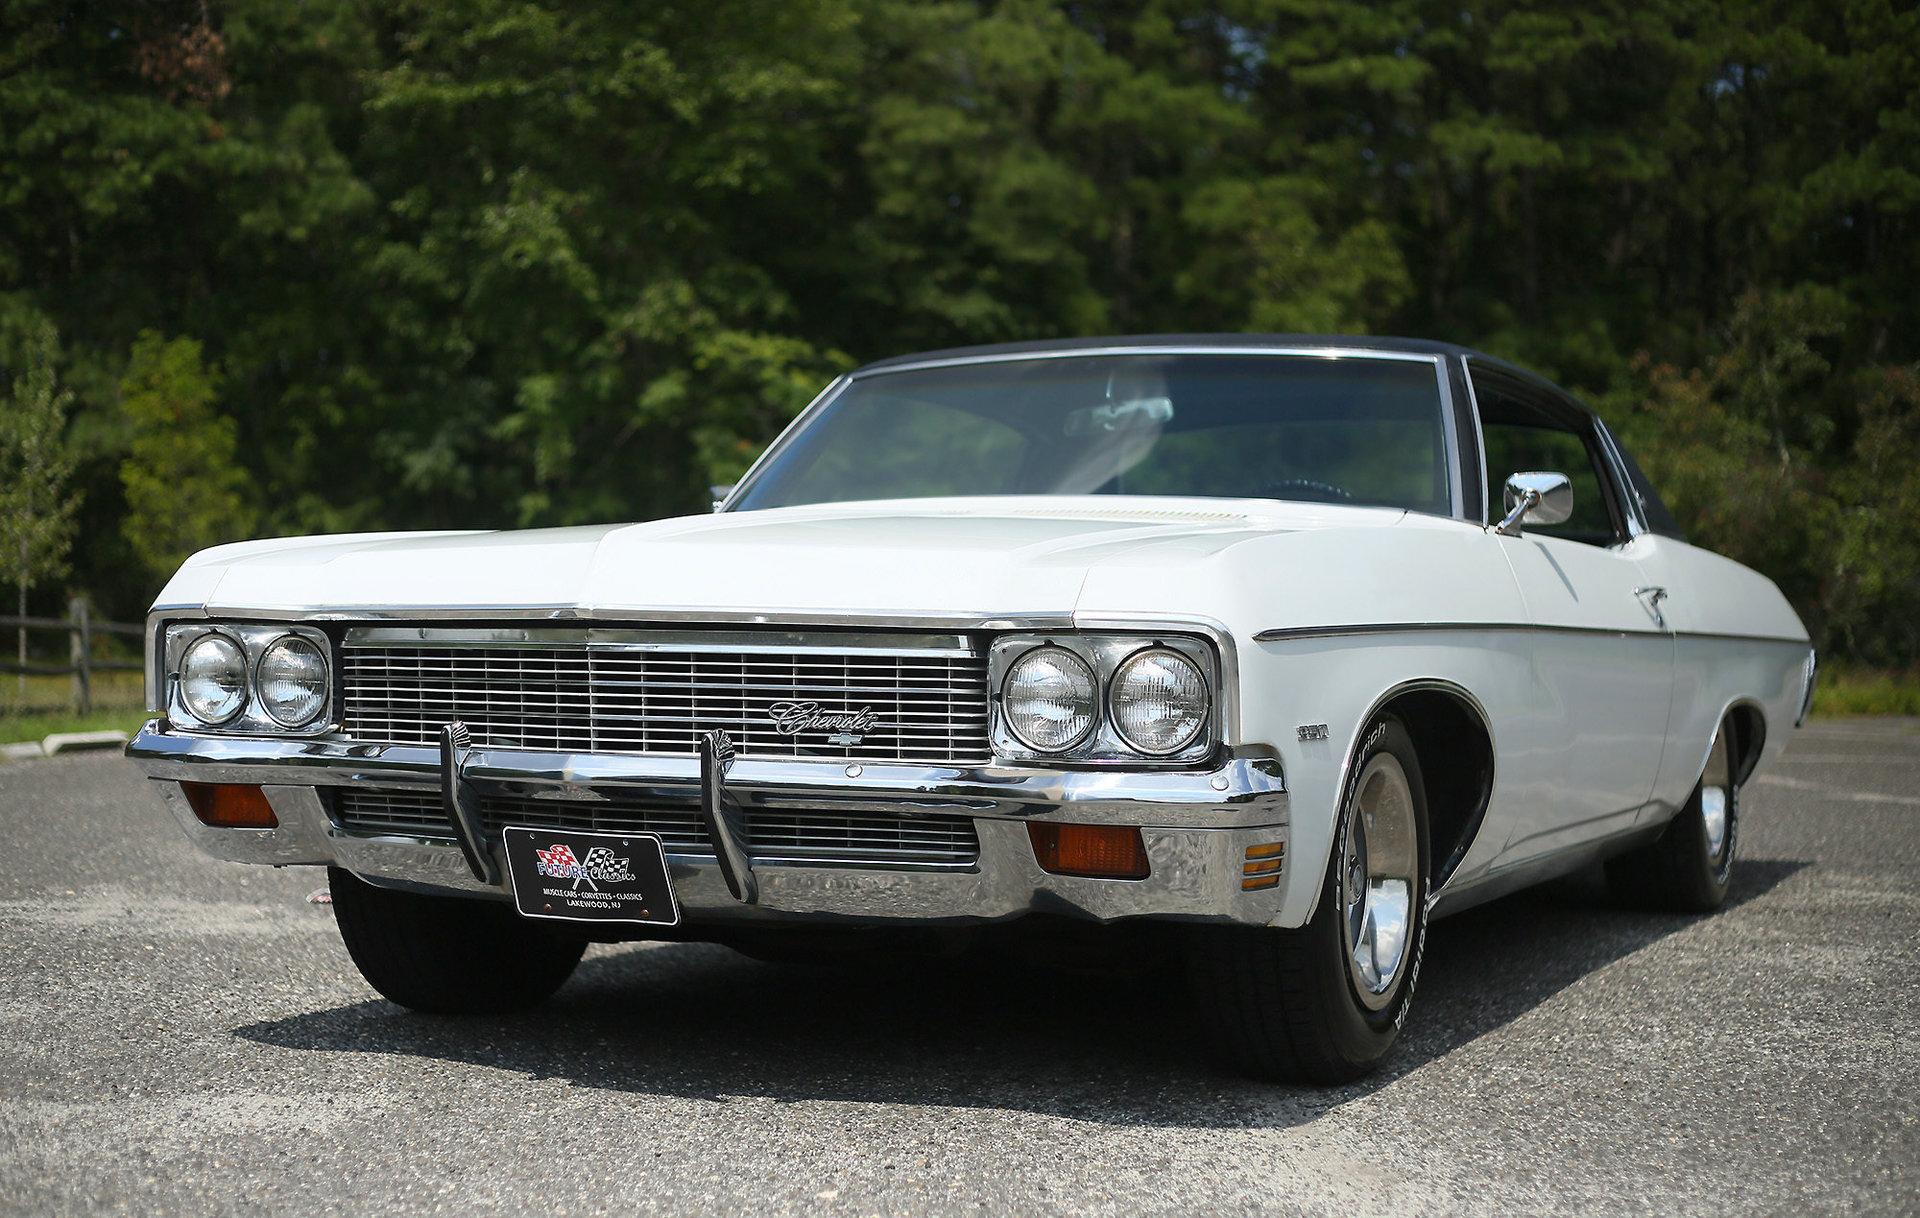 59808729a17c hd 1970 chevrolet impala